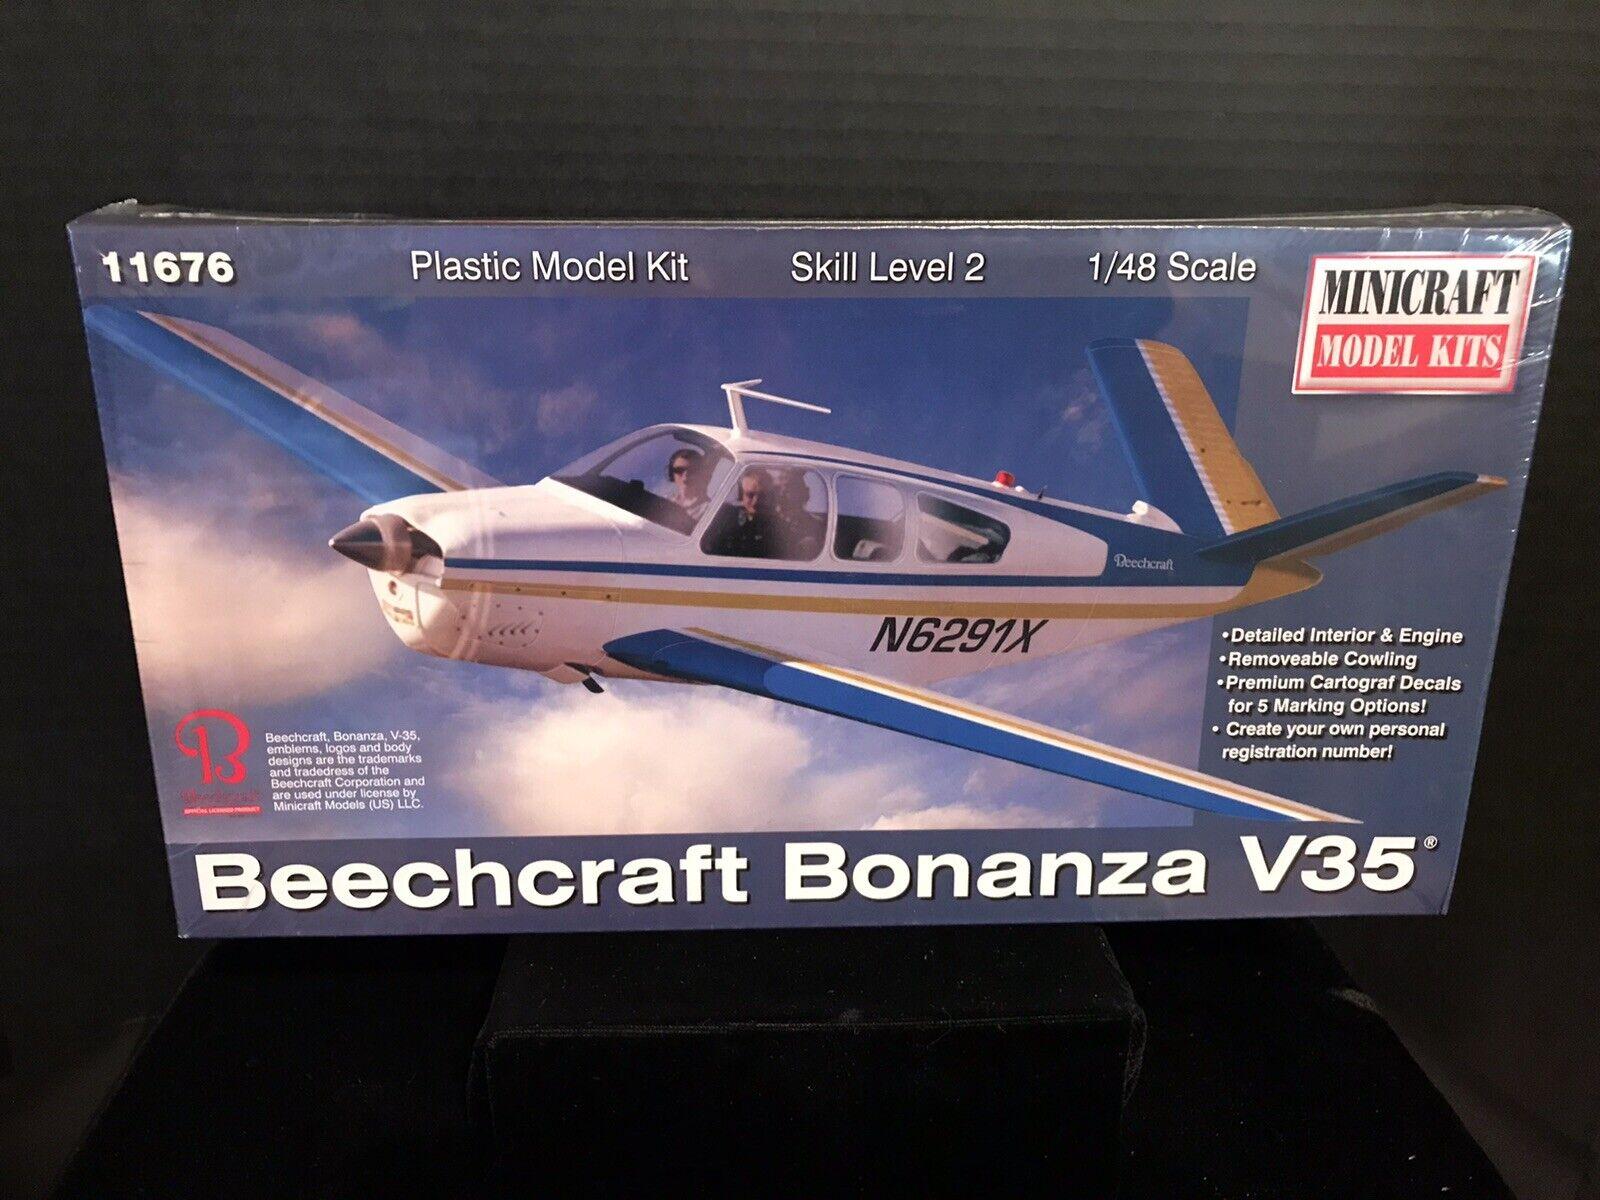 1/48 Bonanza V35 Toys & Games Hobbies pratiyogitanirdeshika.com